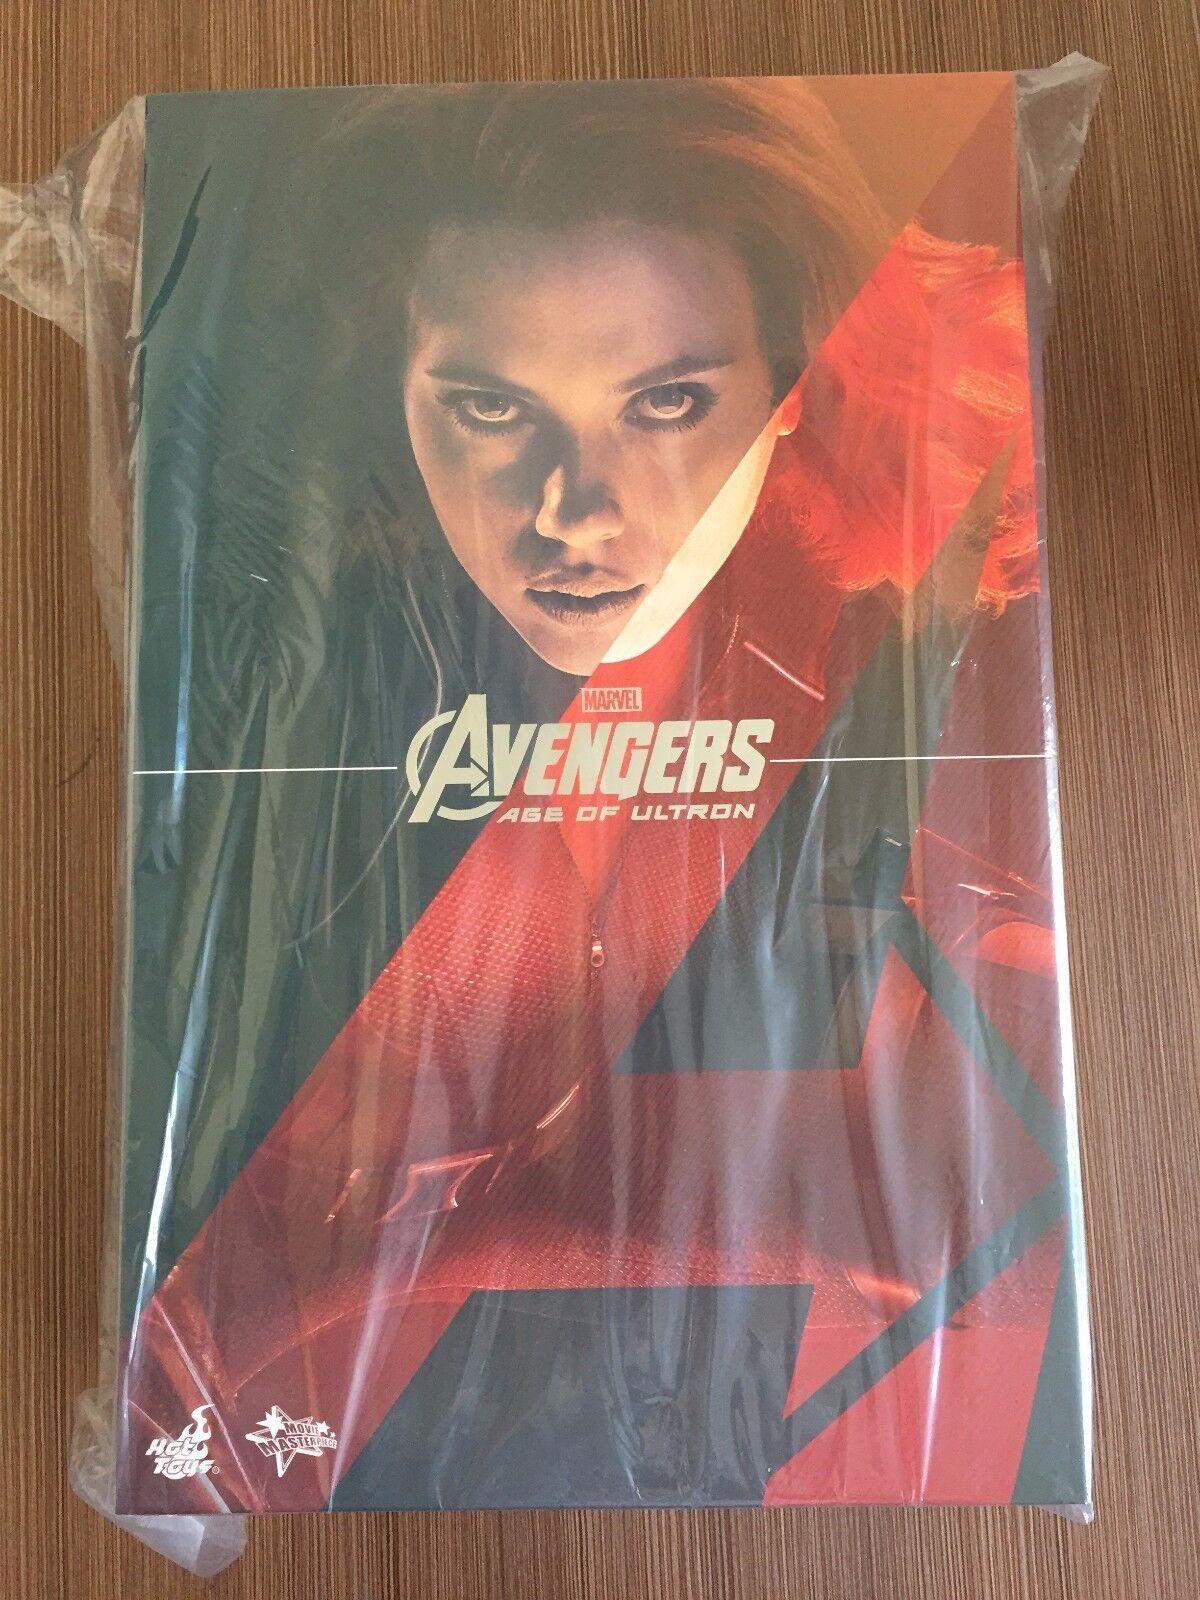 Hot Toys MMS 288 Vengadores Edad de Ultron aou Negro Widow Scarlett Johansson Nuevo